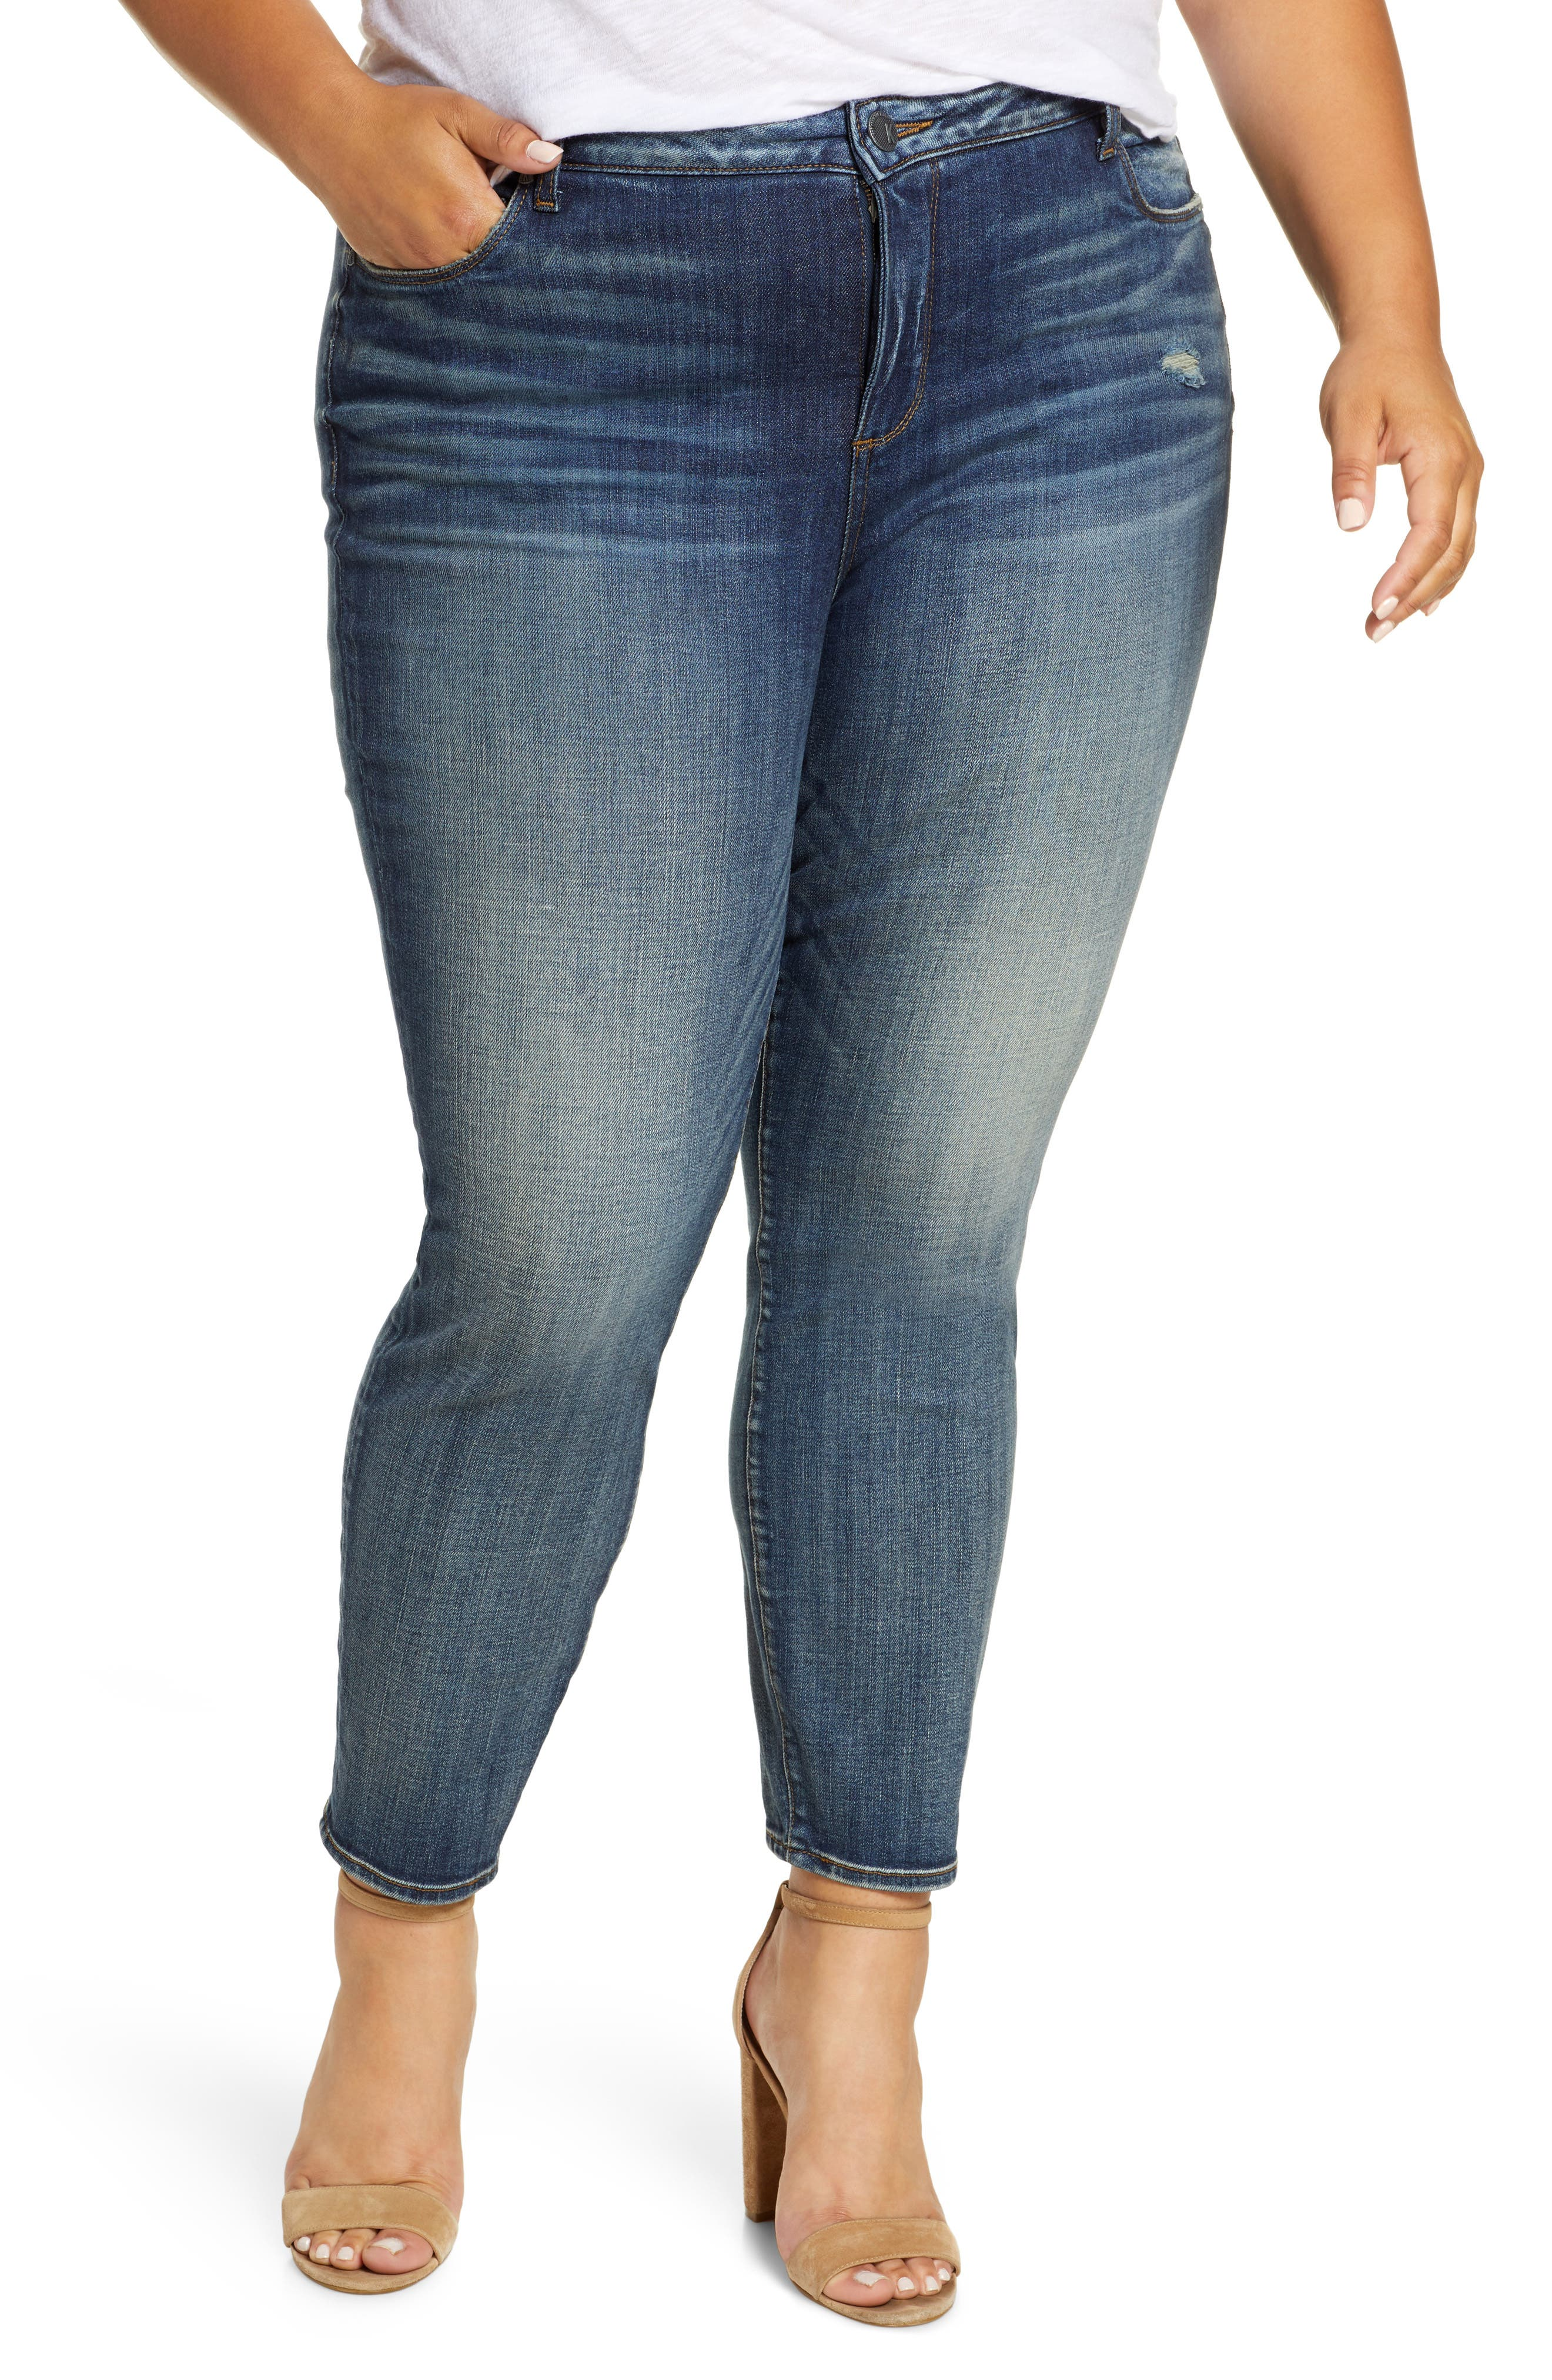 KUT From the Kloth Reese High Waist Straight Leg Jeans (Program) (Plus Size)